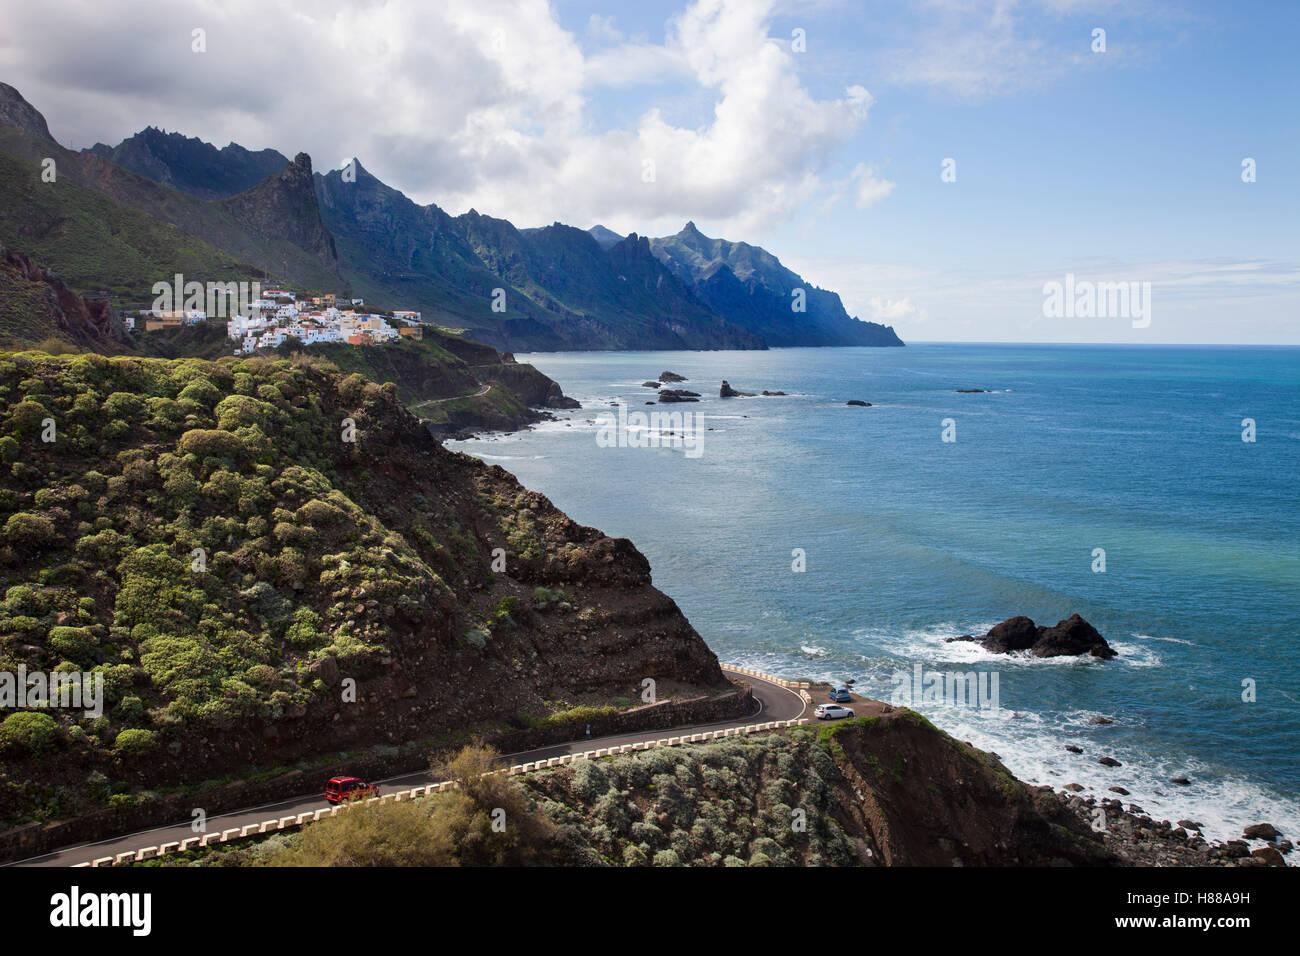 View with Taganana village, Anaga Mountains, Parque Rural Anaga, Tenerife island, Canary archipelago, Spain, Europe Stock Photo